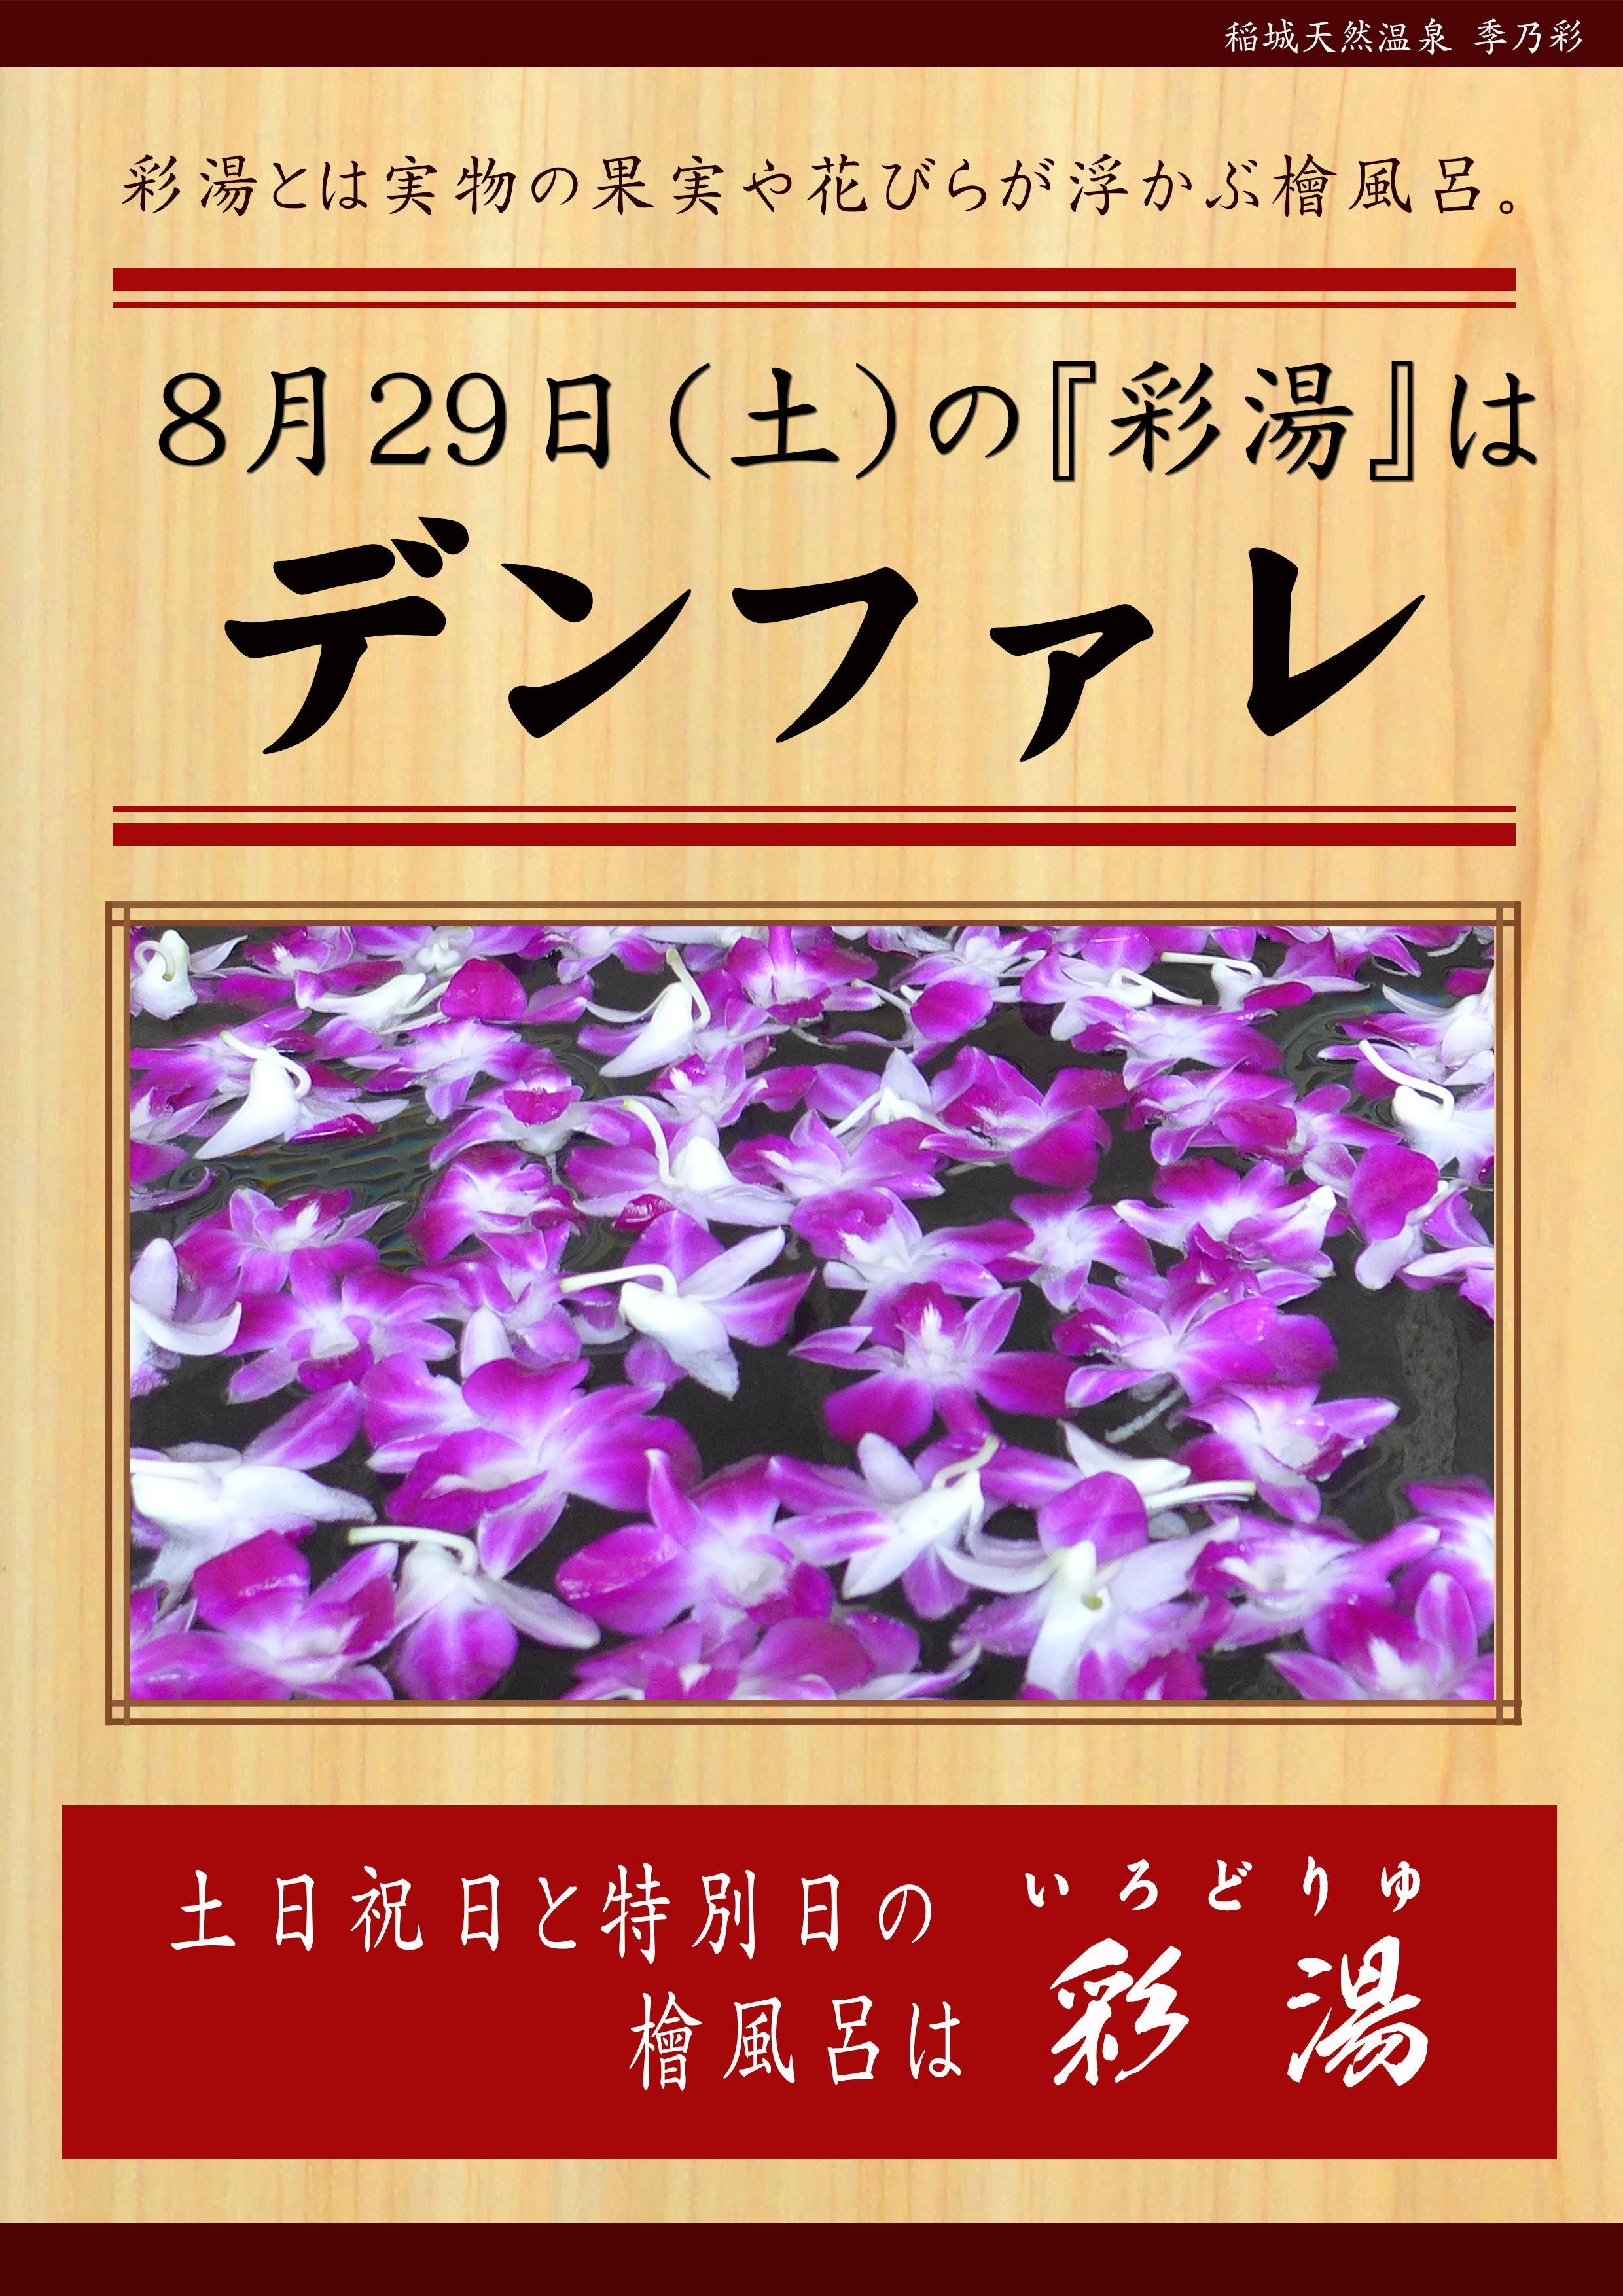 200829 POP イベント 彩湯 男女湯 デンファレ